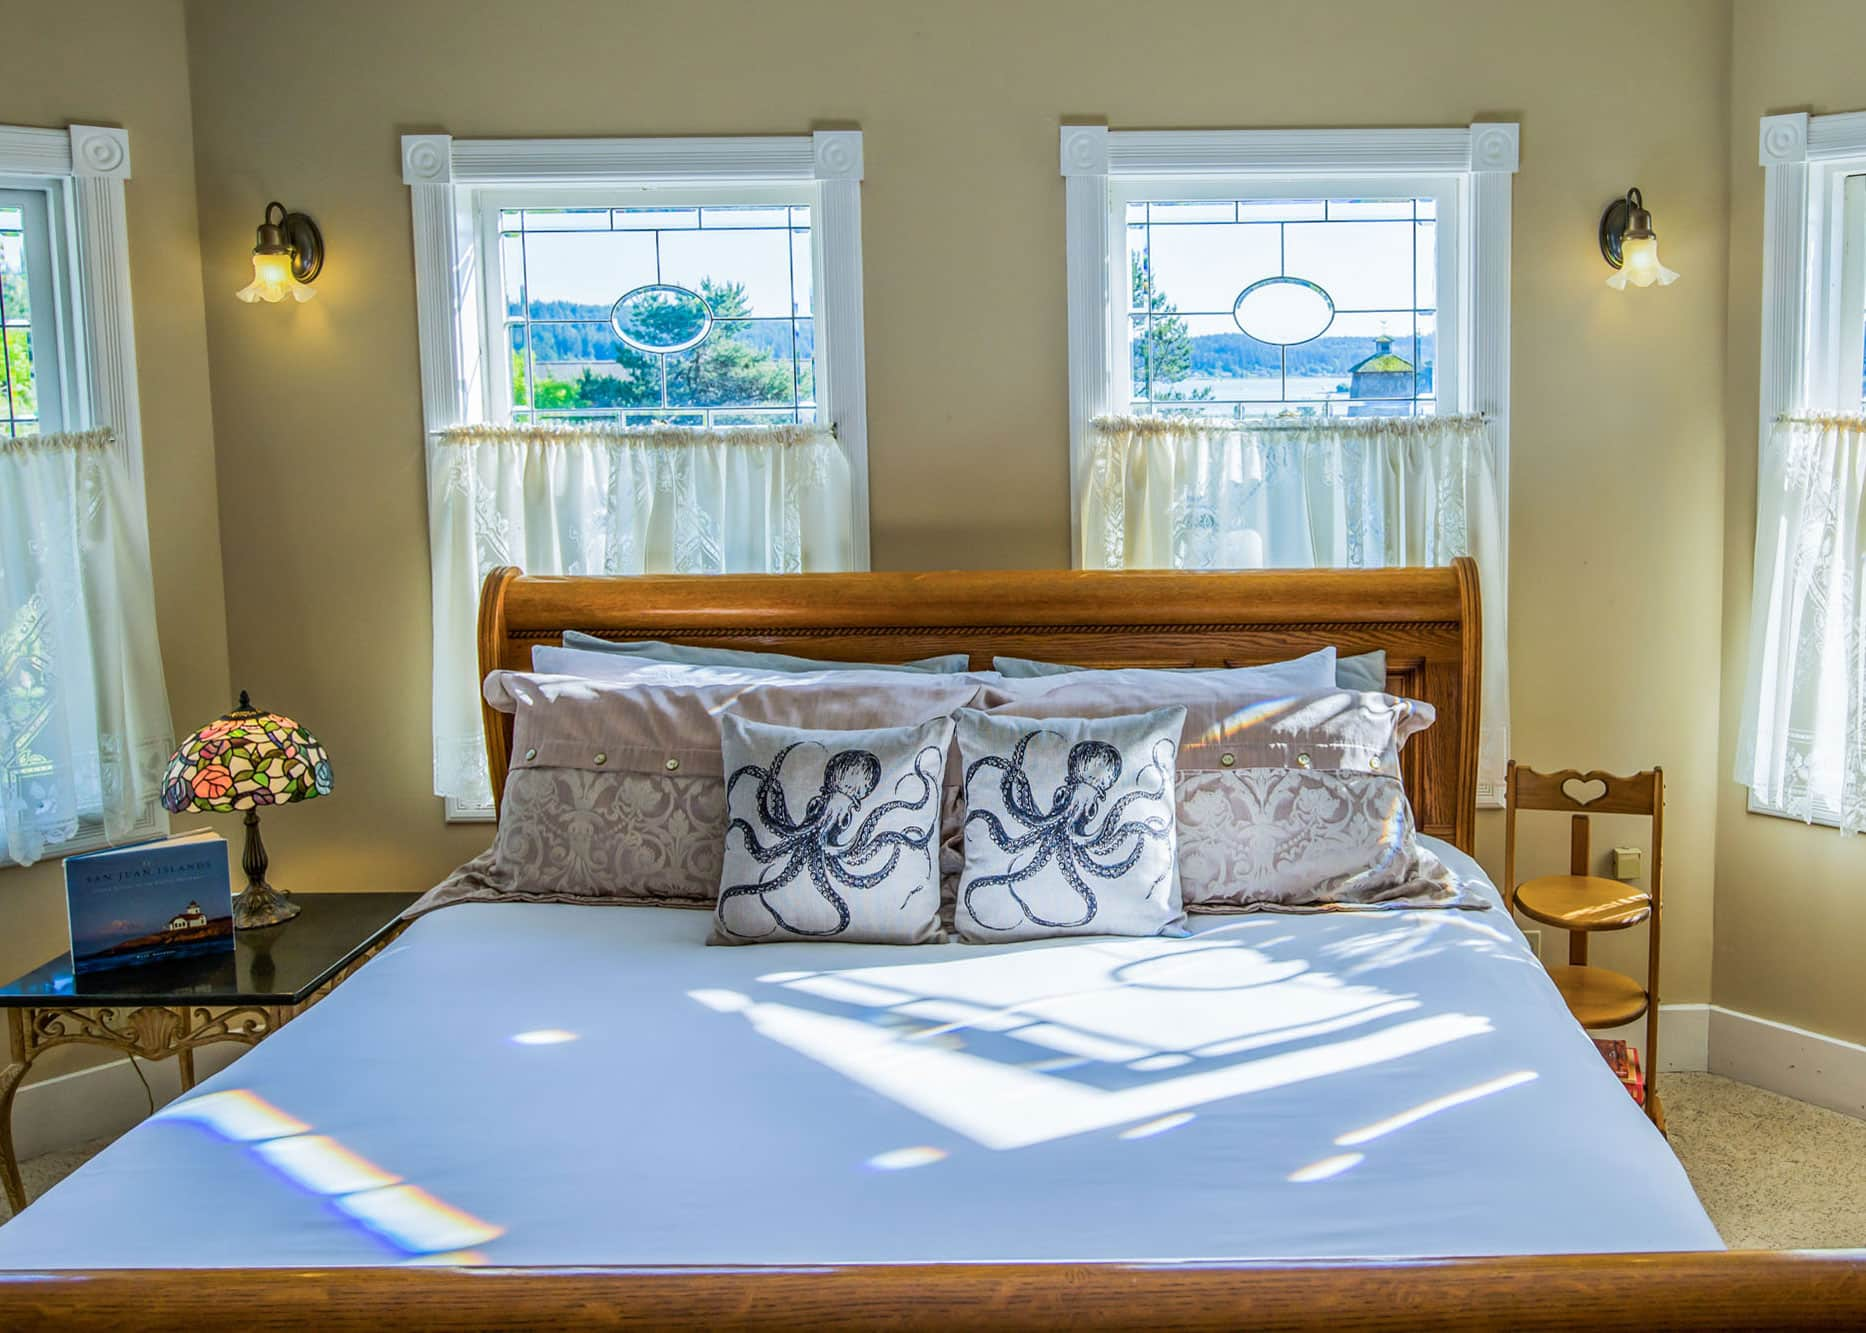 the-edenwild-inn-lopez-island-lodging-2020-room-06-01